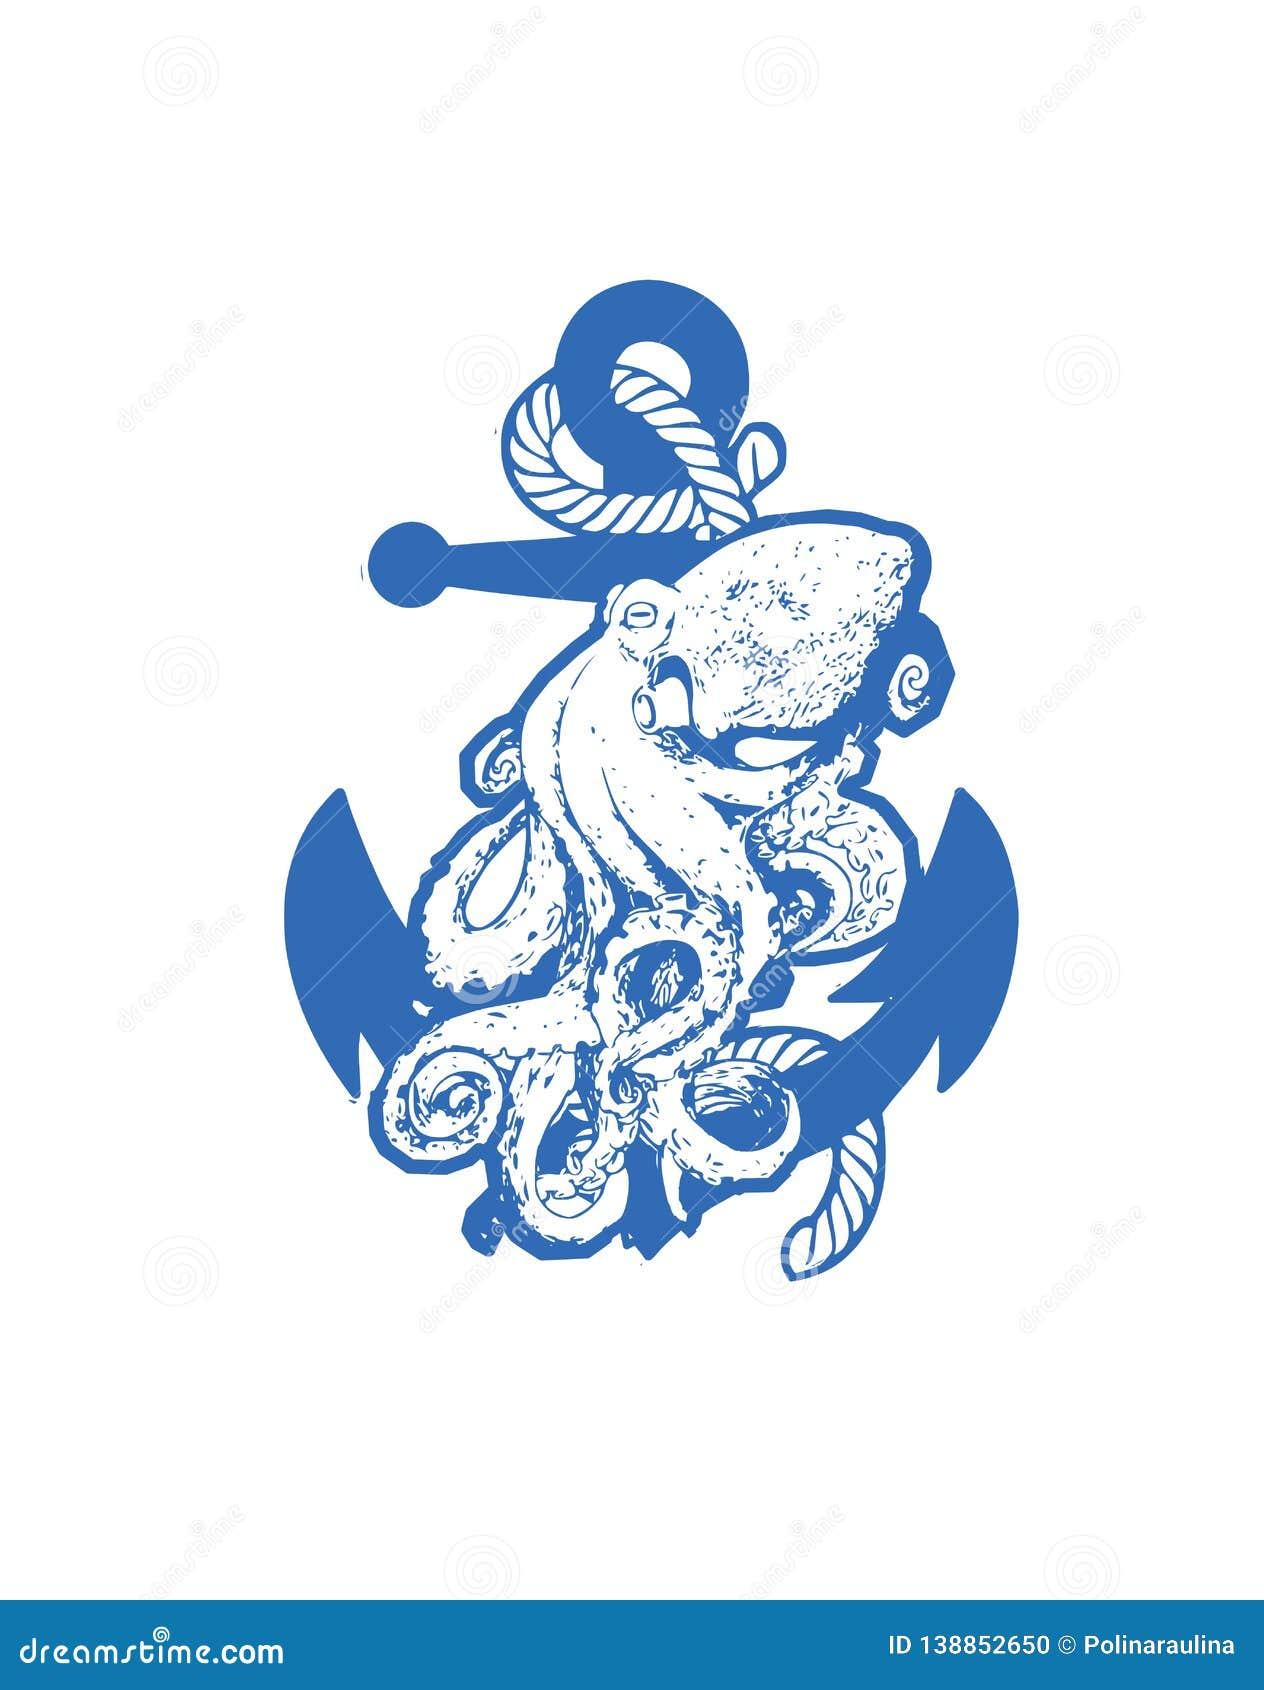 Octopus Vector Illustration. Stock Photo - Illustration of canvas ...